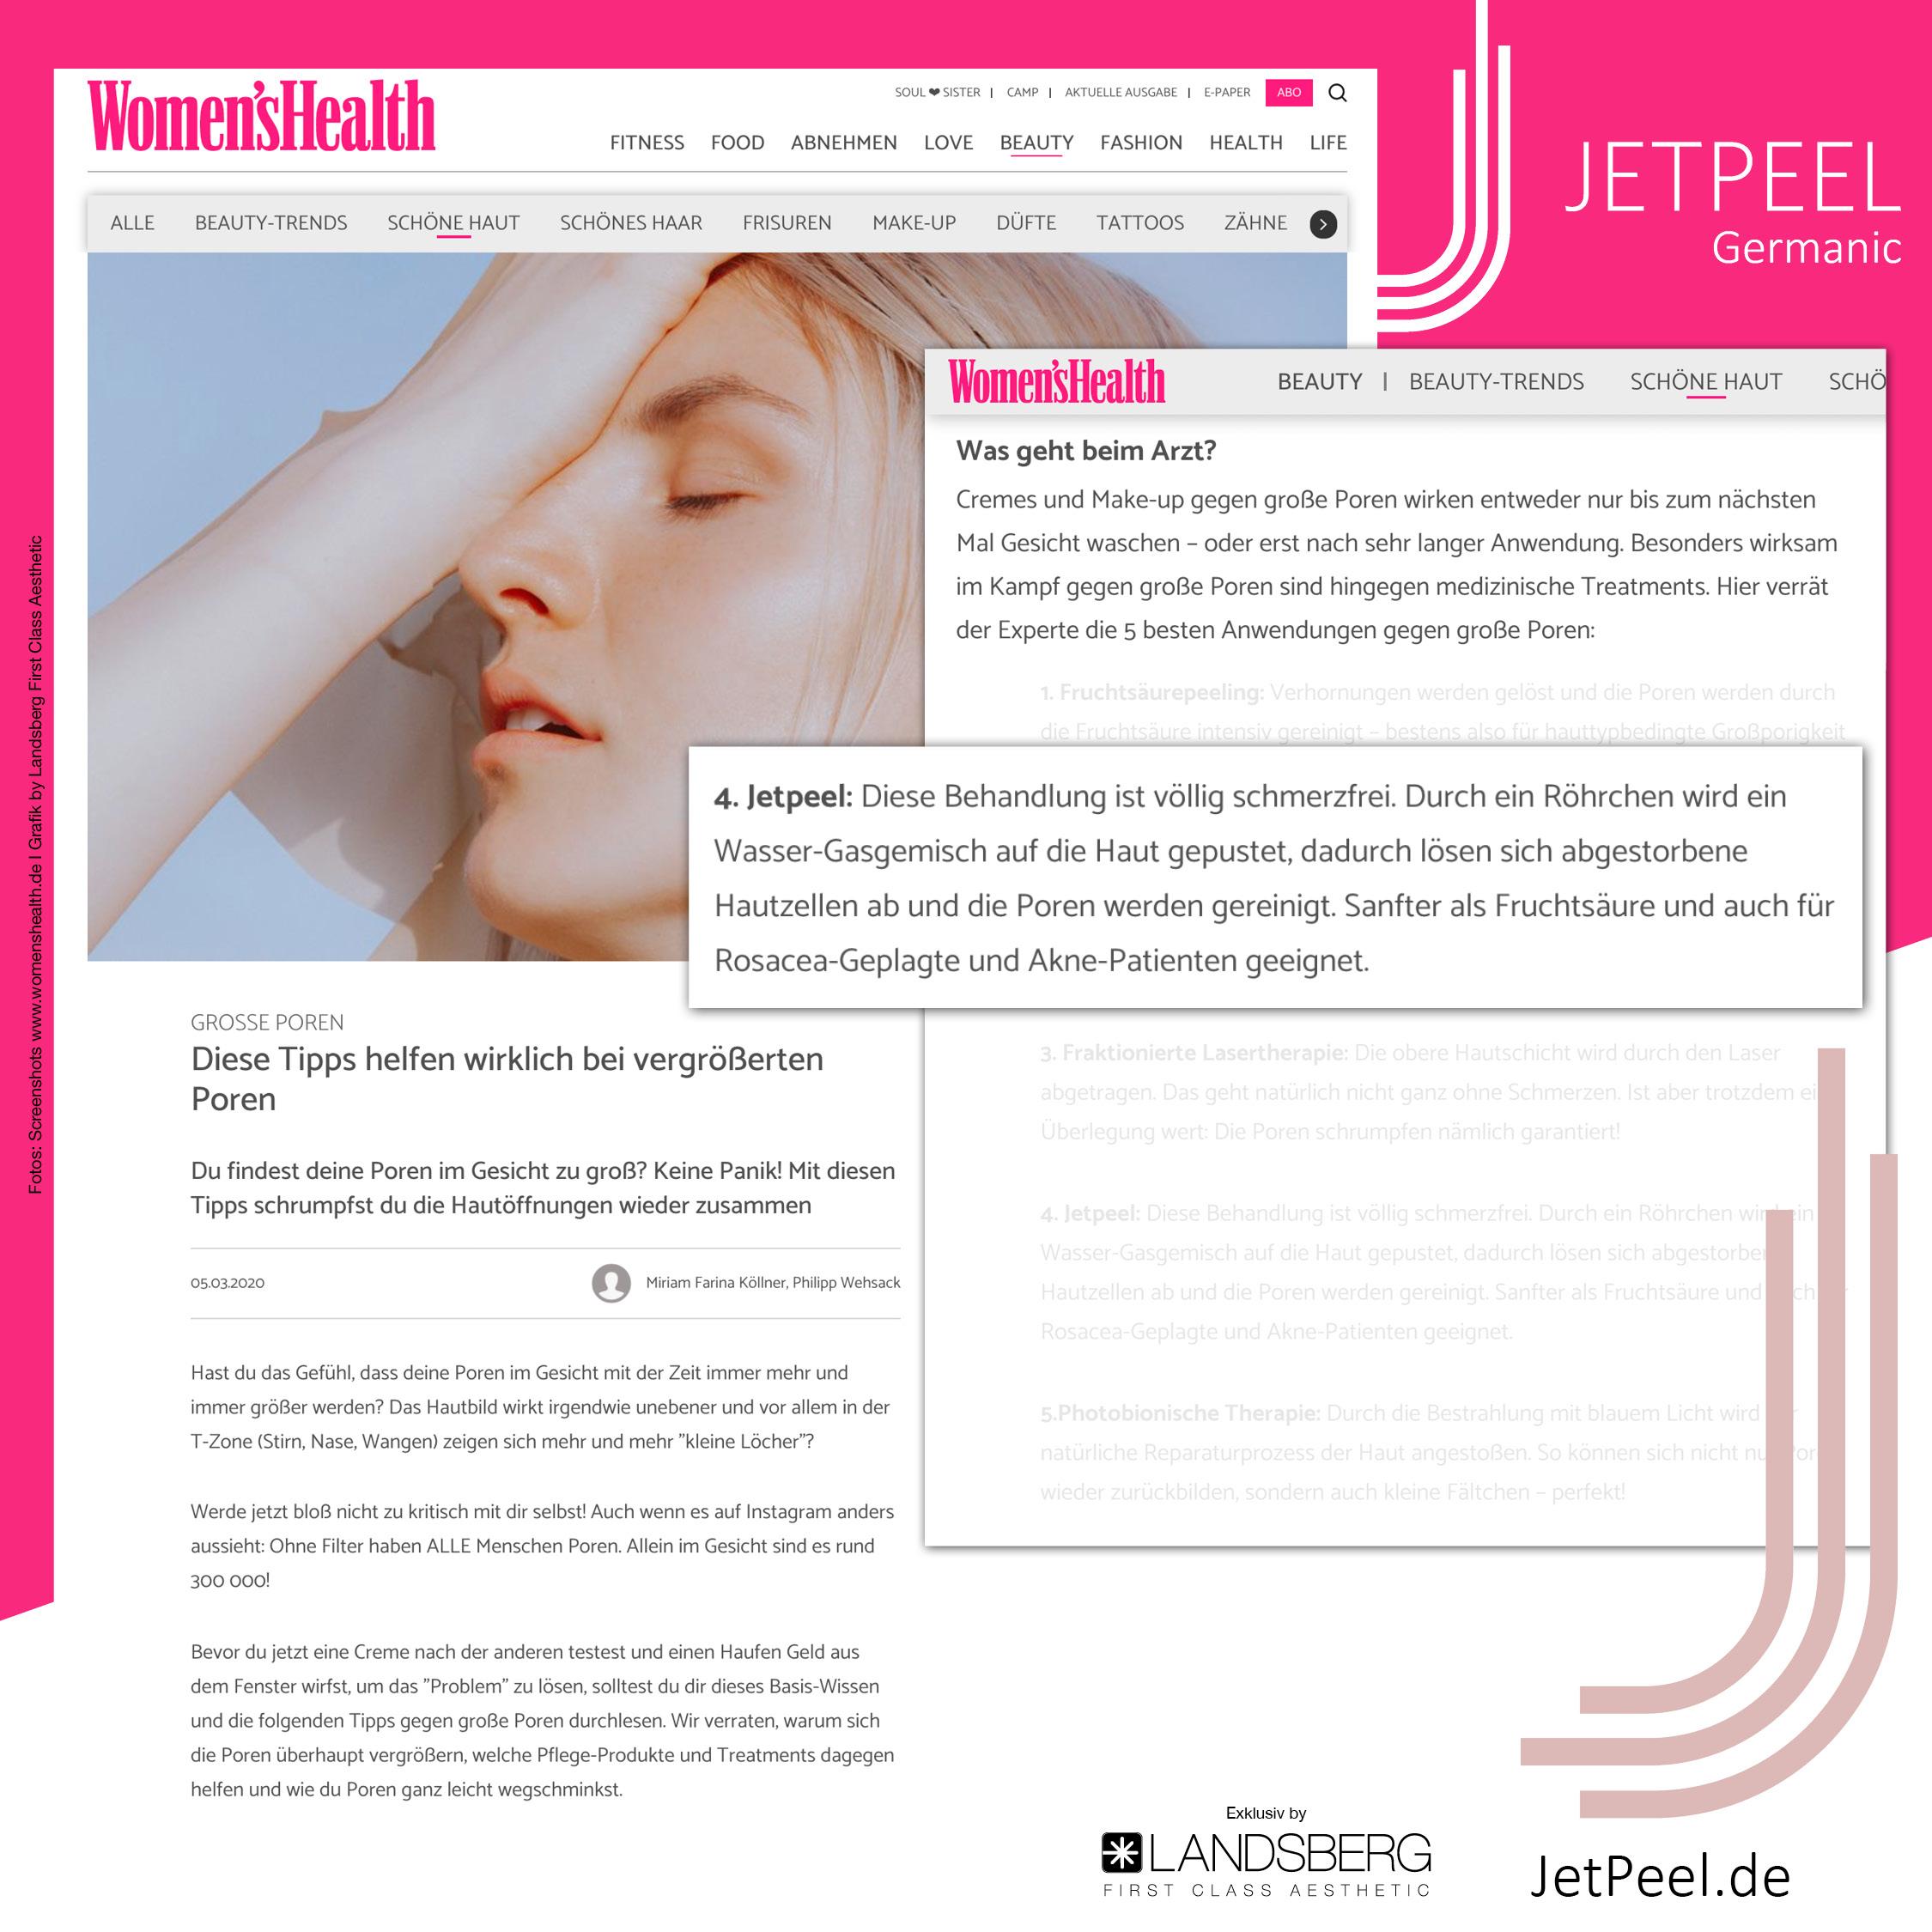 "JetPeel™ unter den Top5 der besten Anwendungen bei ""Women'sHealth"""